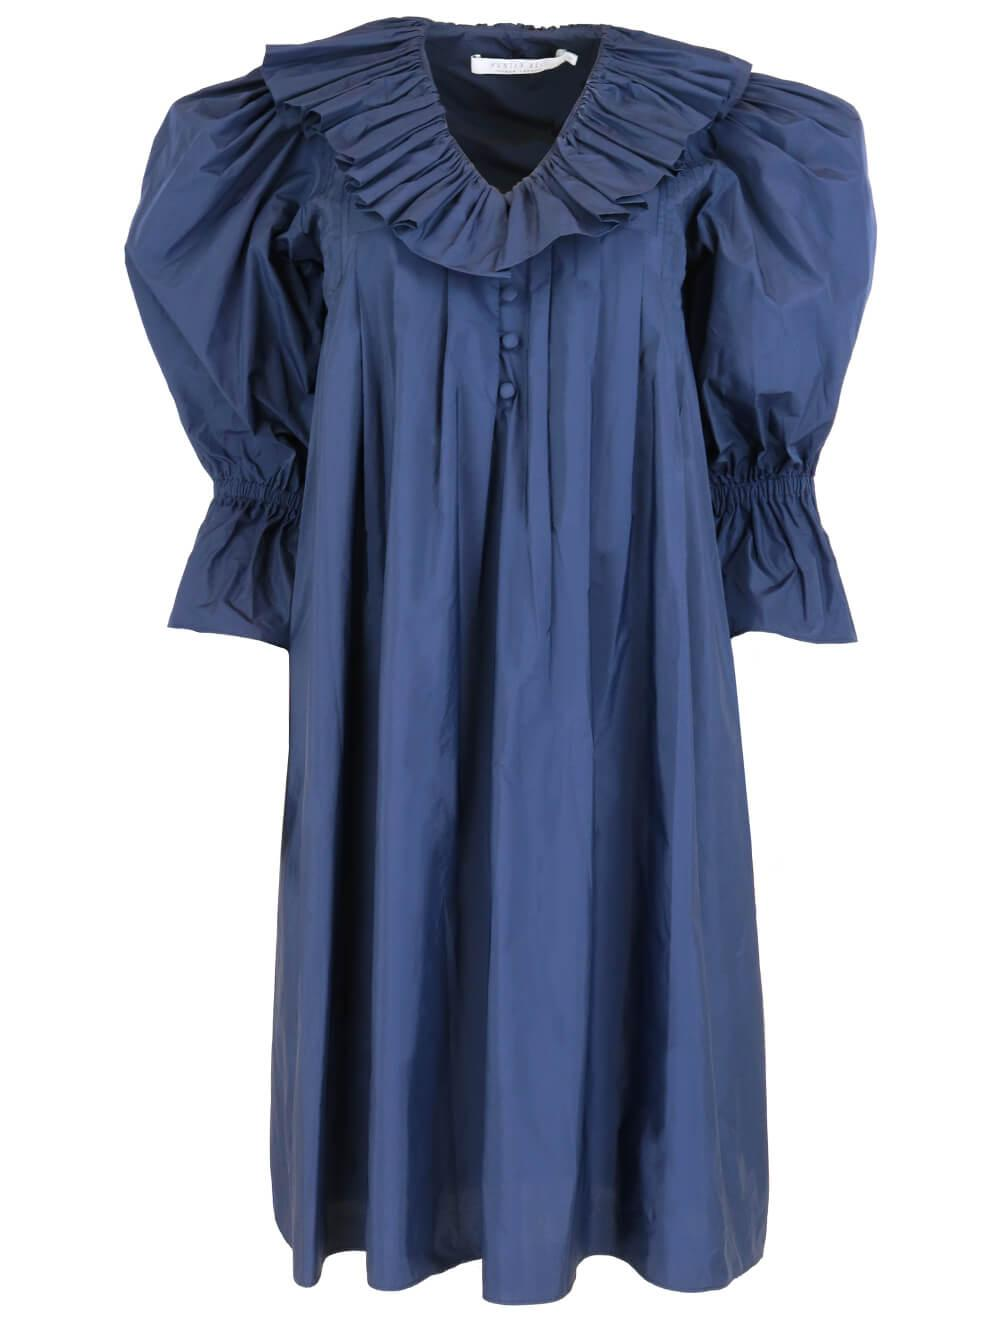 Sullivan Dress Item # 20FD4